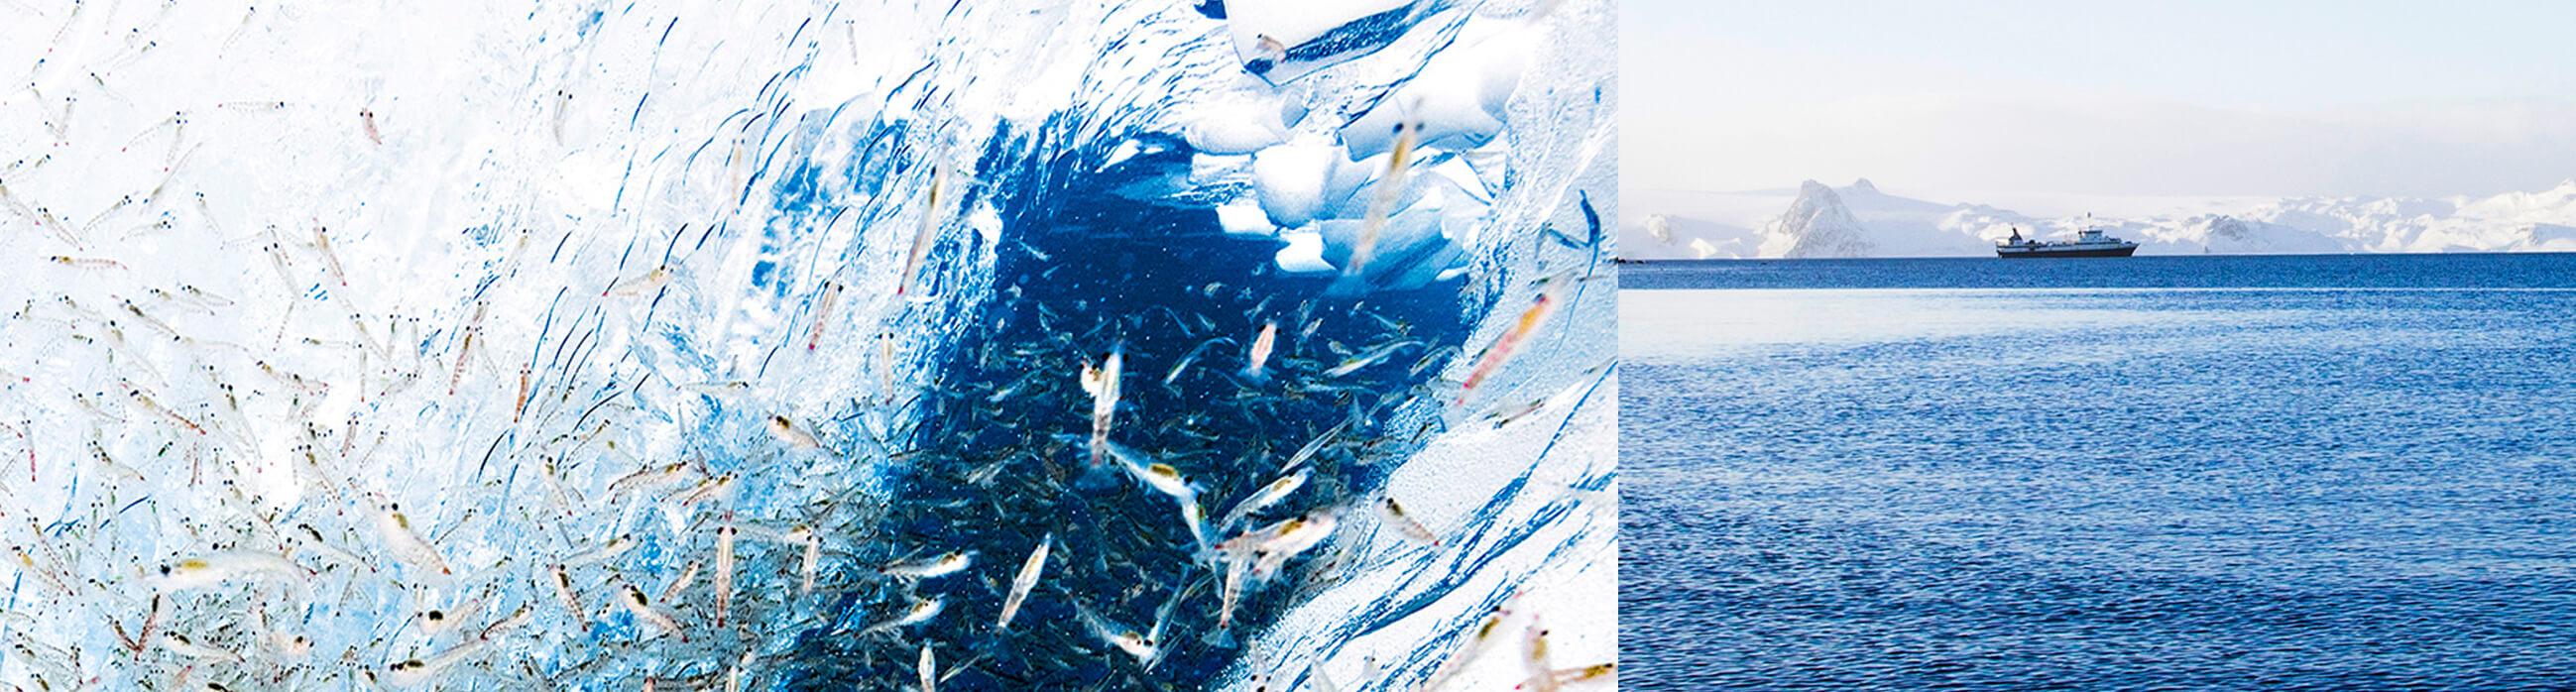 Qrill aqua from Euphausia Superba Antarctic Krill.jpg